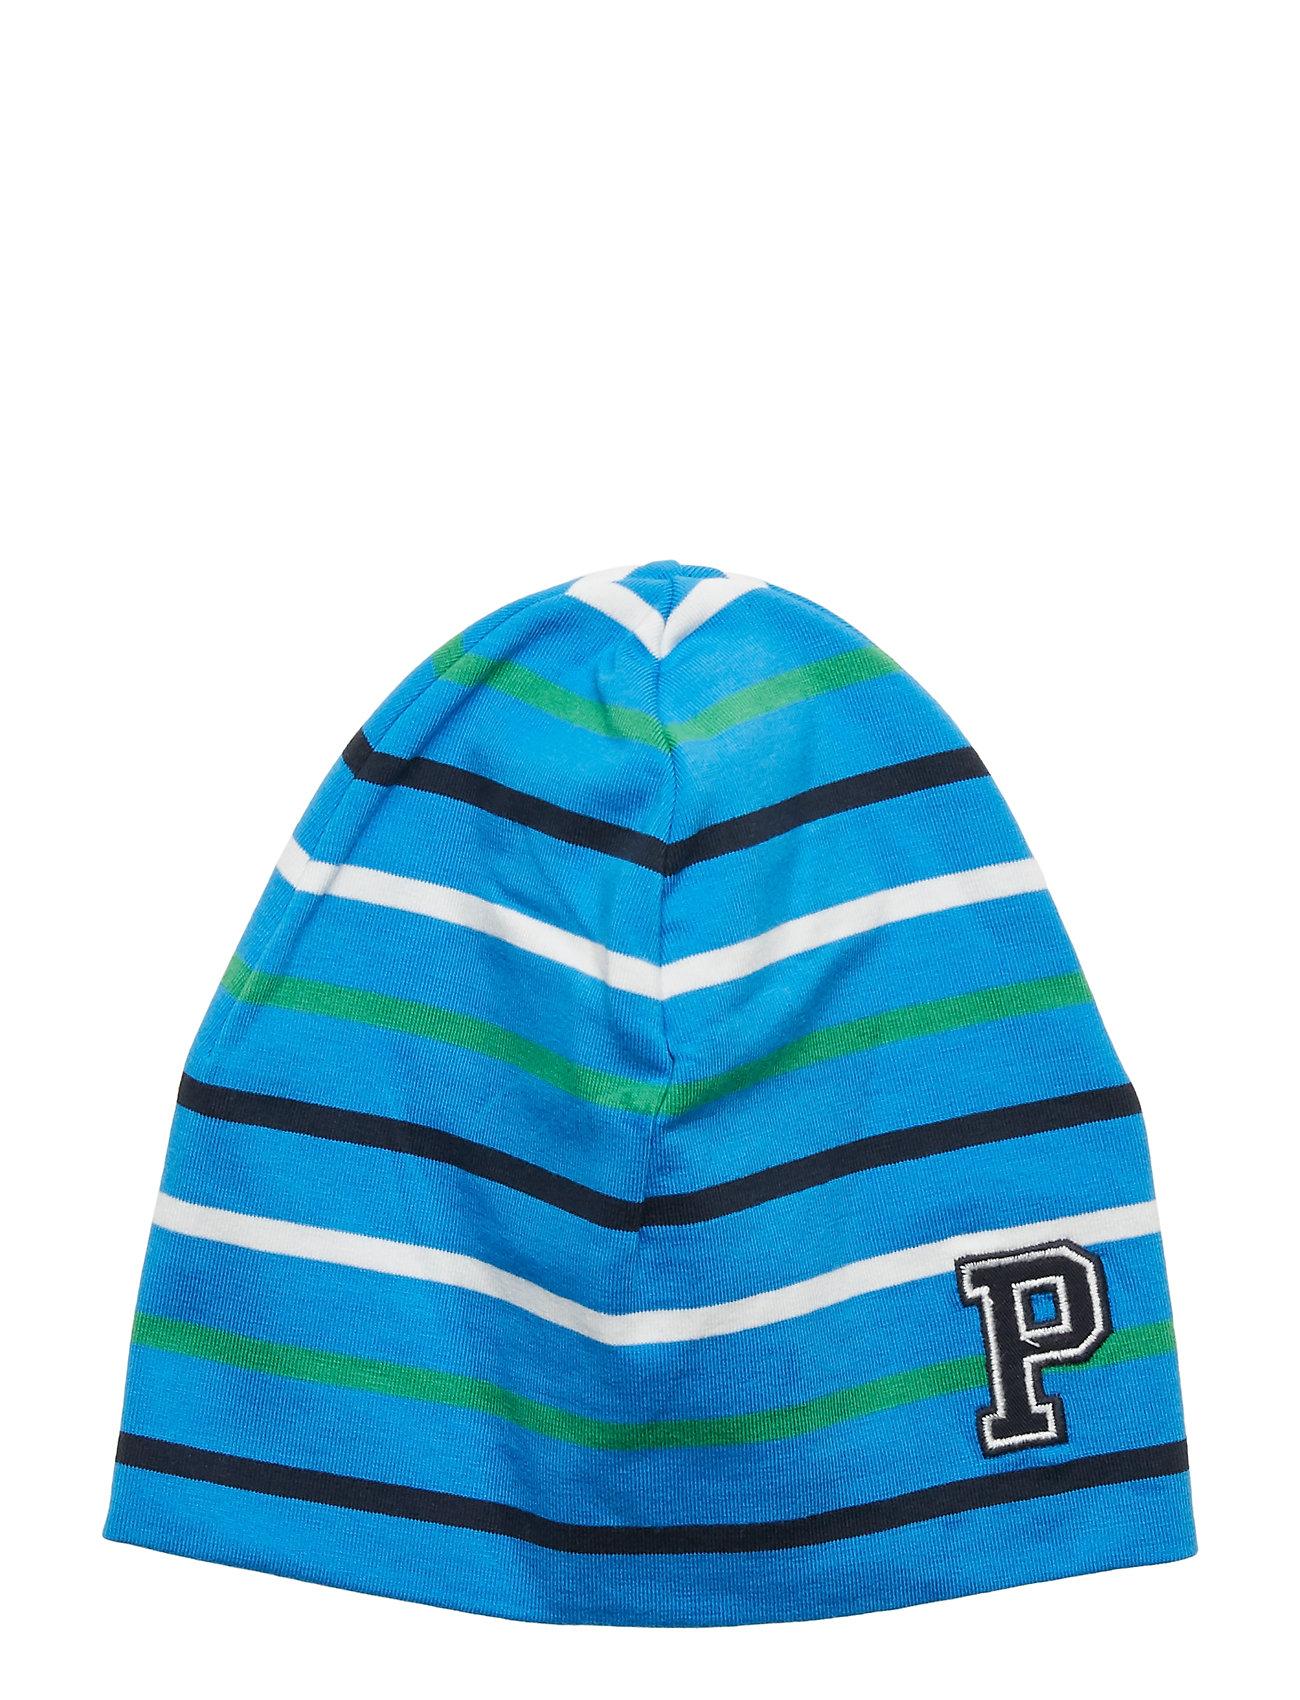 Polarn O. Pyret Cap Multi Stripe Baby - FRENCH BLUE